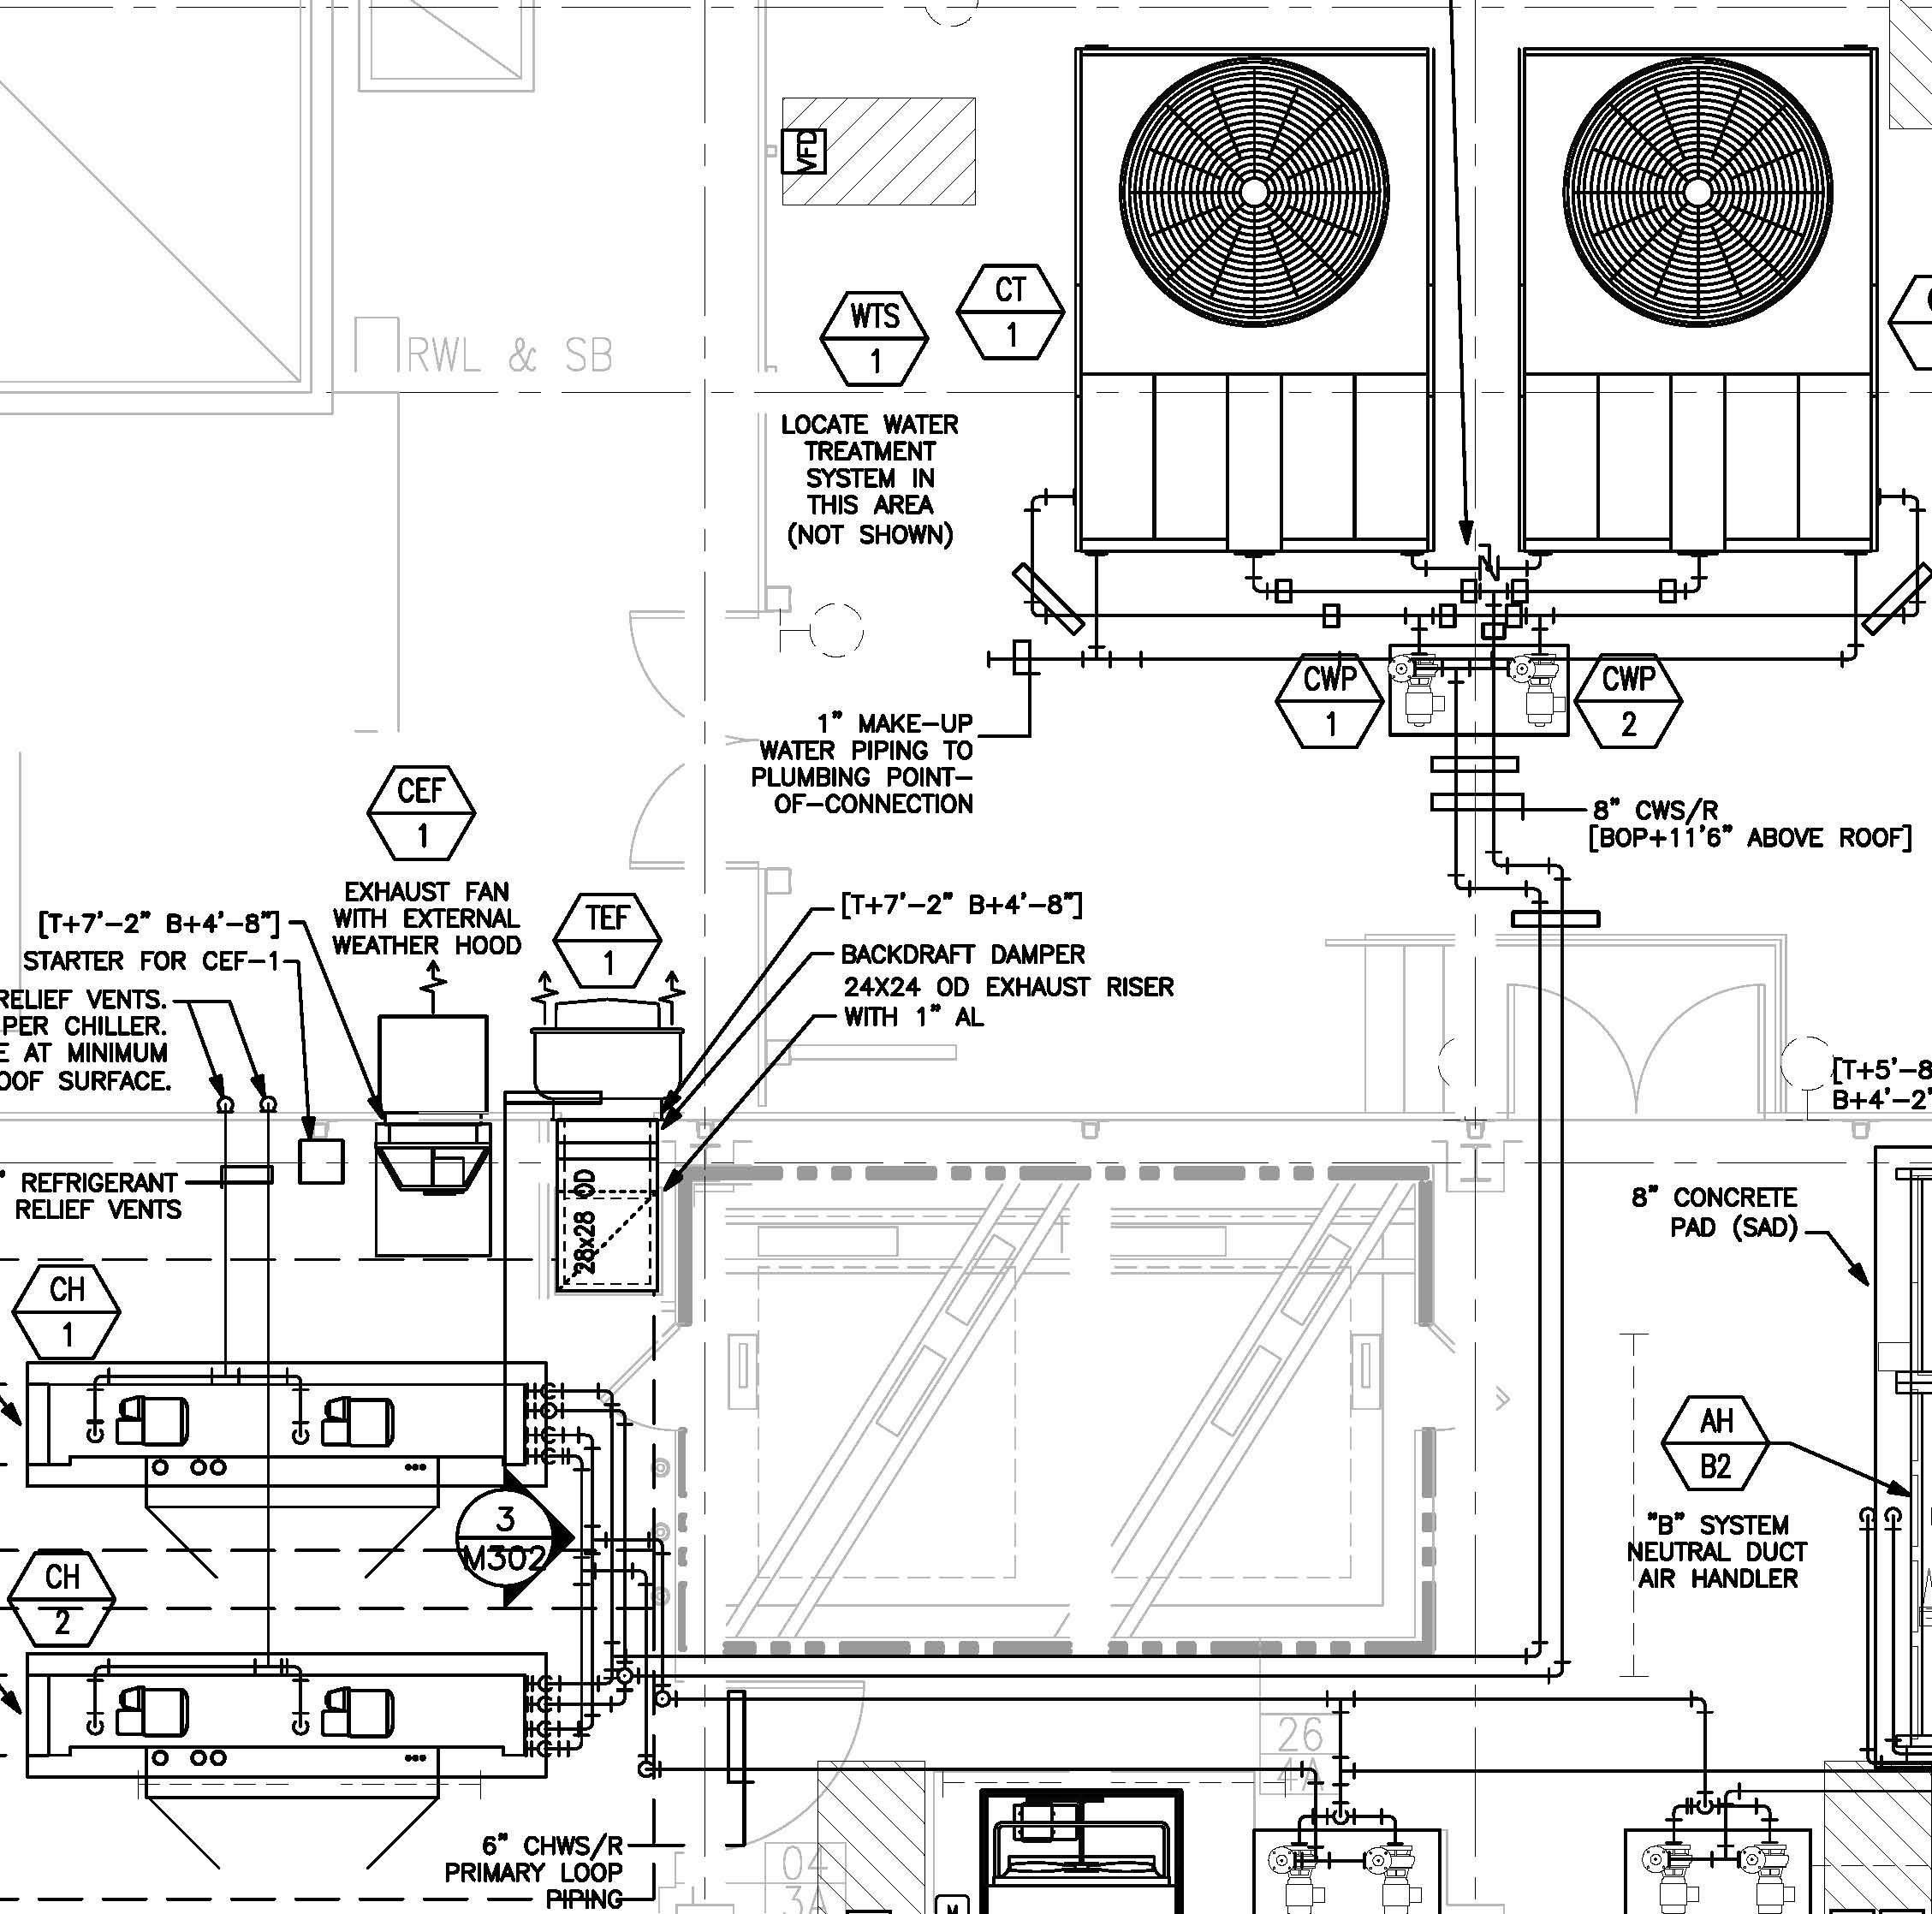 honeywell fan limit switch wiring diagram wiring diagram